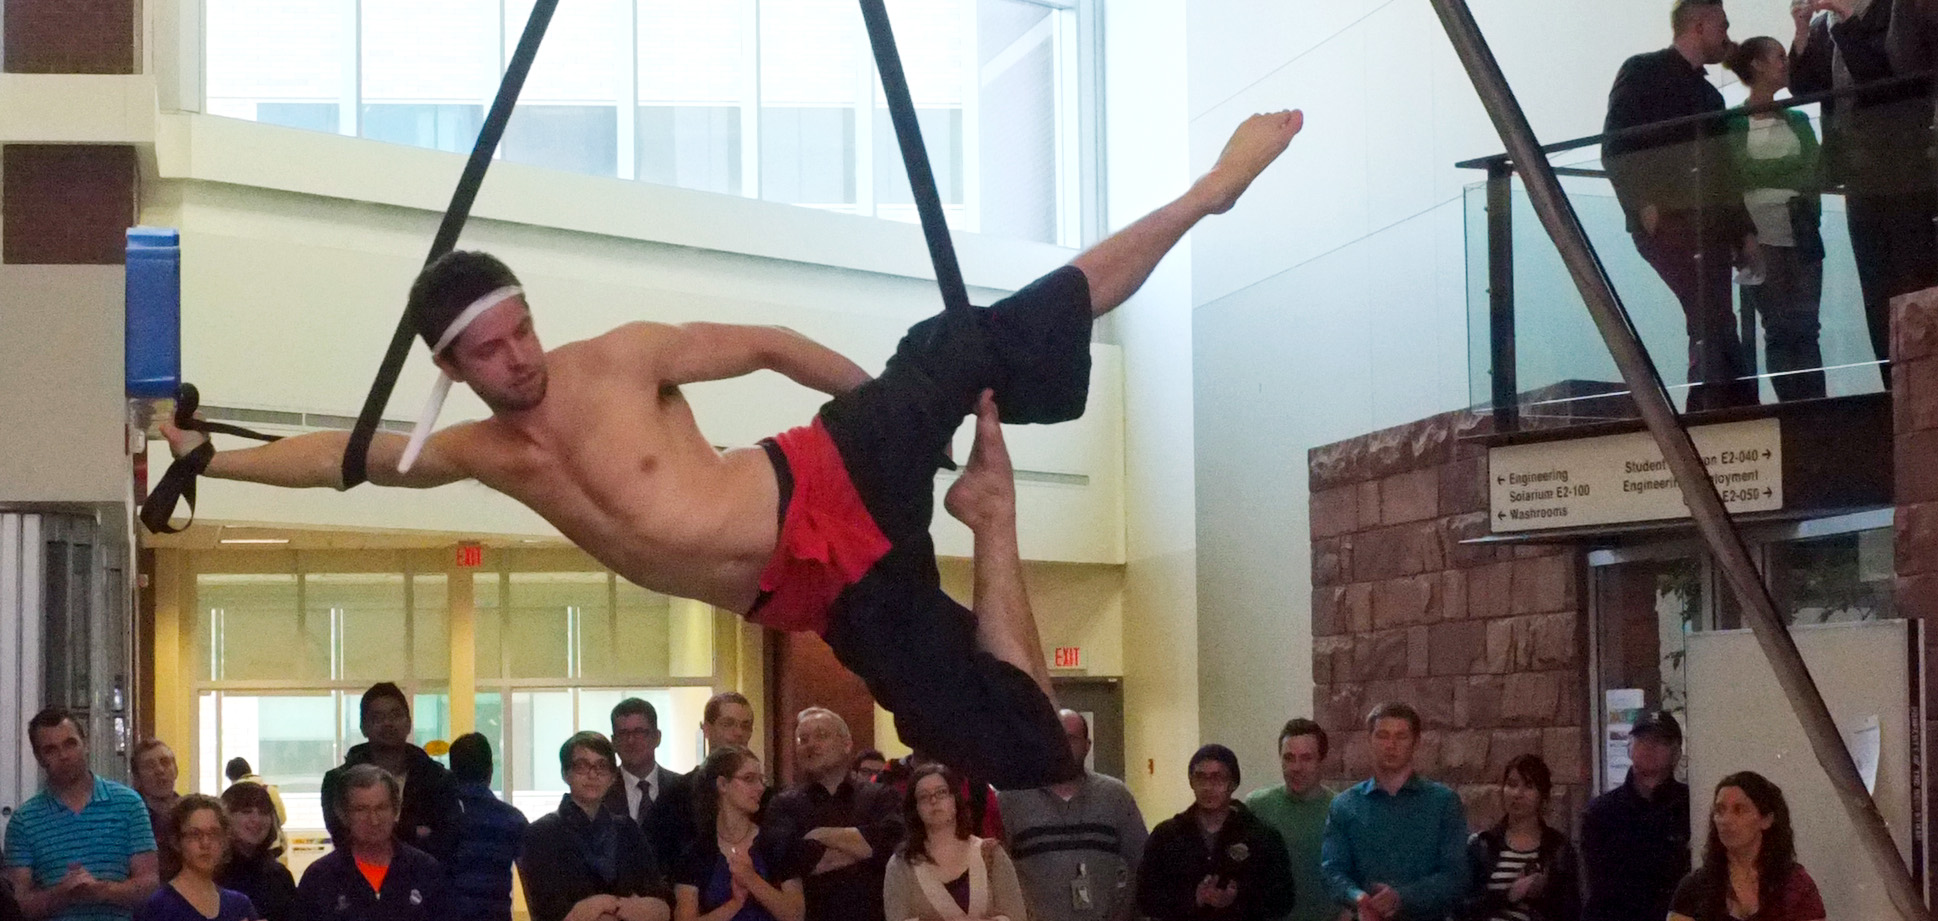 Erik - Firefly Theatre and Circus Aerial Arts Program